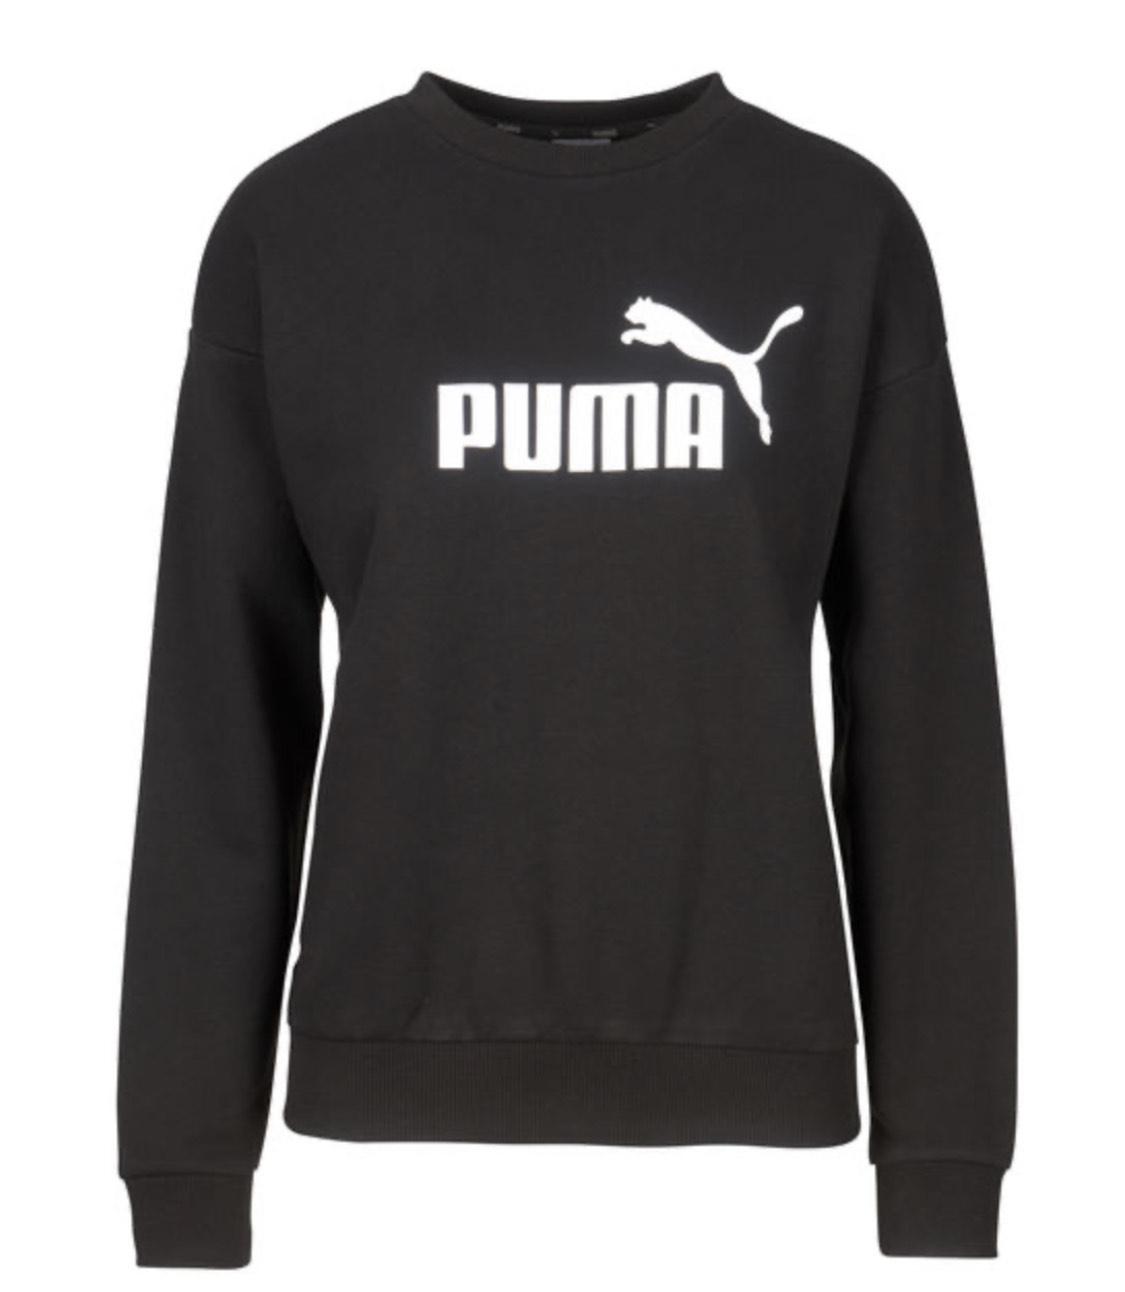 [KIK Abholung] Puma Damen Sweater in schwarz oder grau